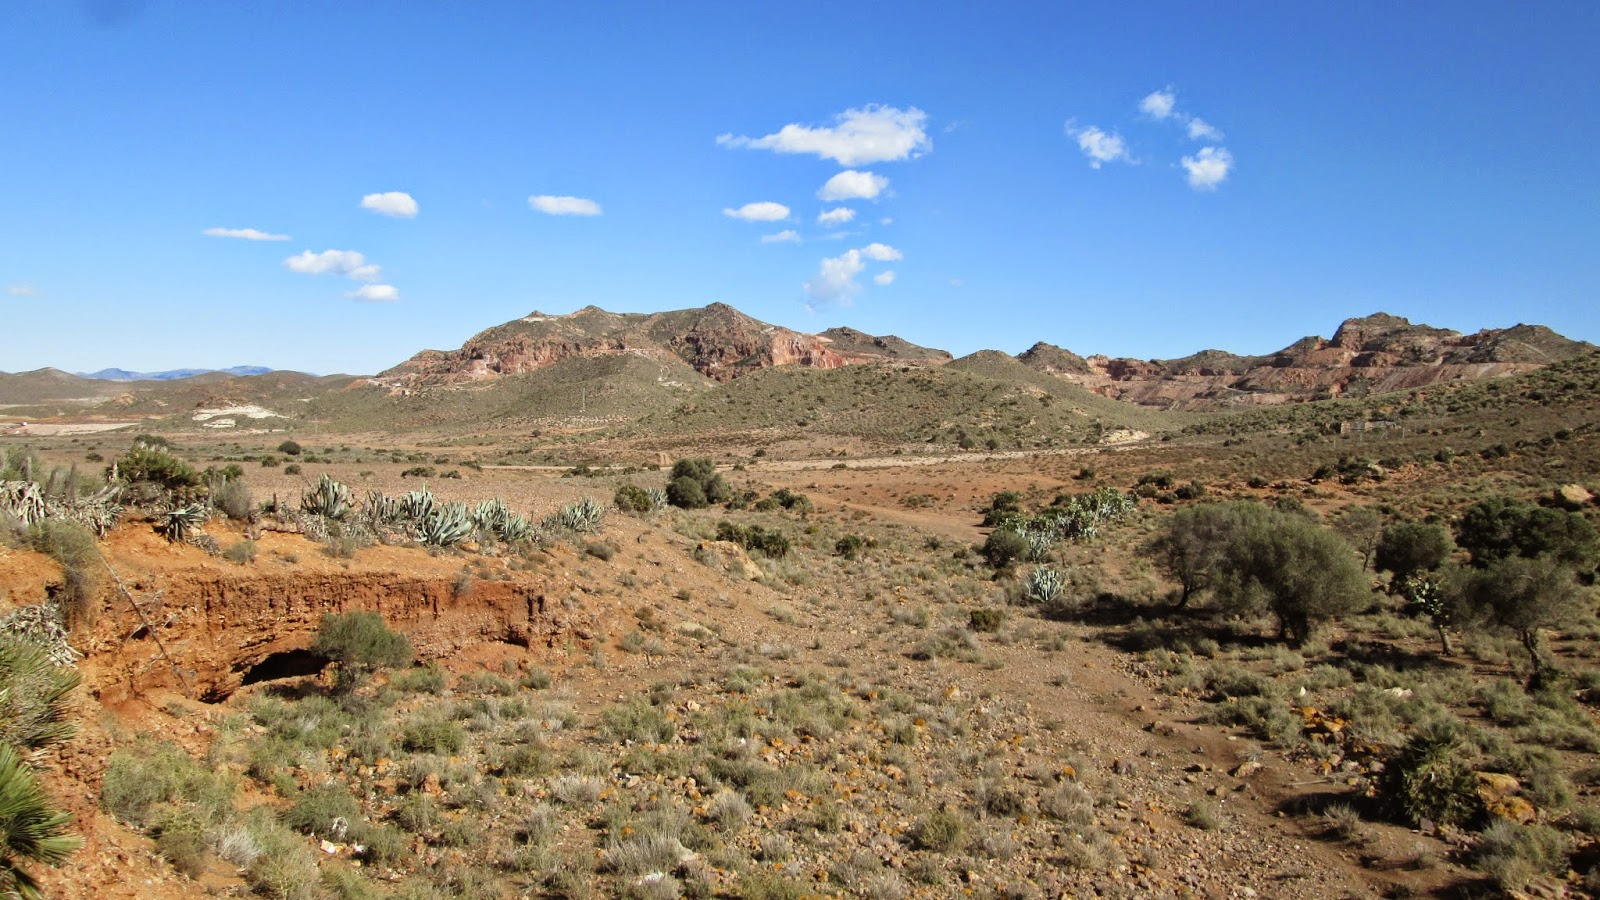 Mines at Rodalquilar